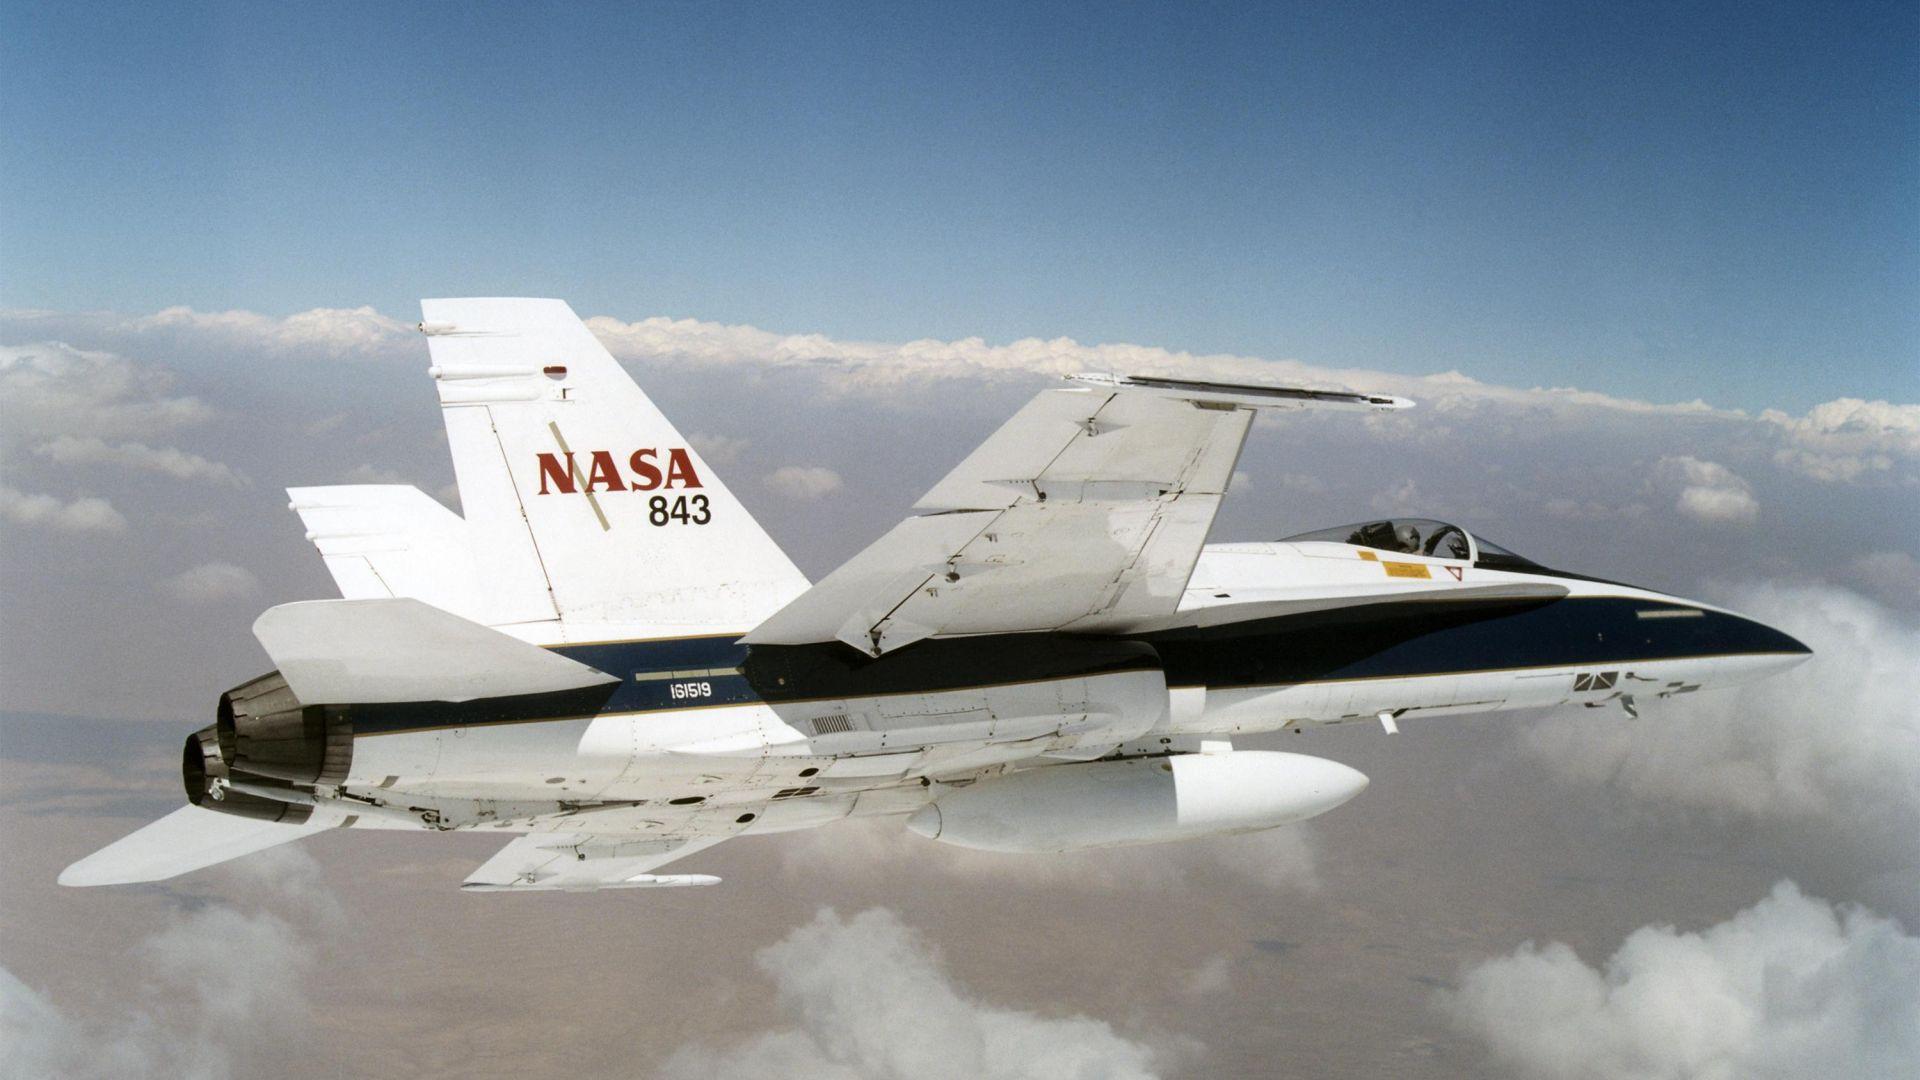 Обои F-35a, истребители, Thunderbird. Авиация foto 12